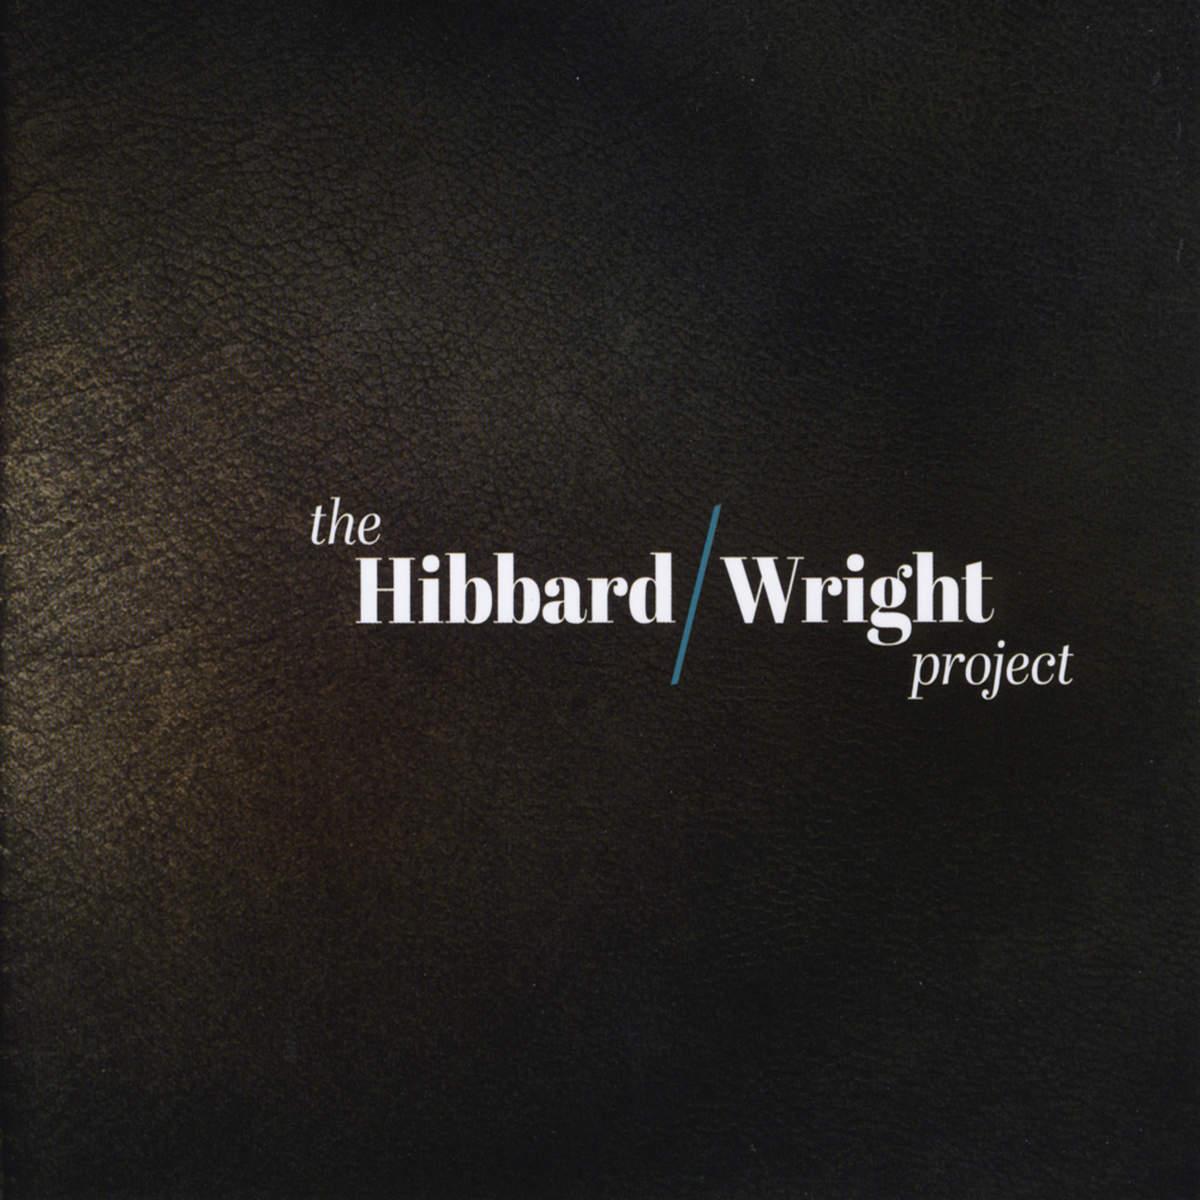 The Hibbard/Wright Project — November 19, 2015 — Red Light Café, Atlanta, GA